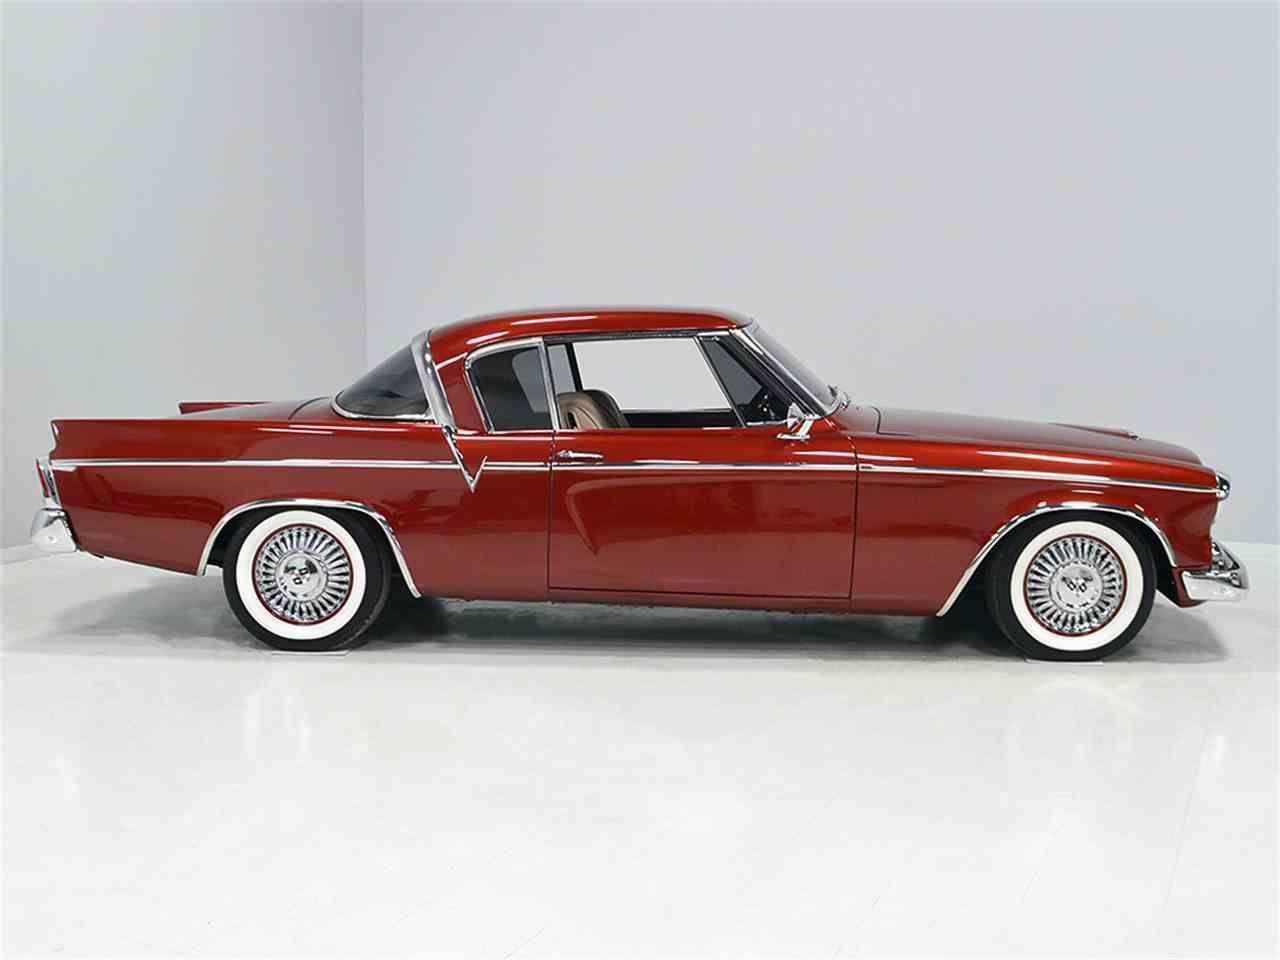 1956 Studebaker Golden Hawk for sale | Listing ID: CC-1069585 ...